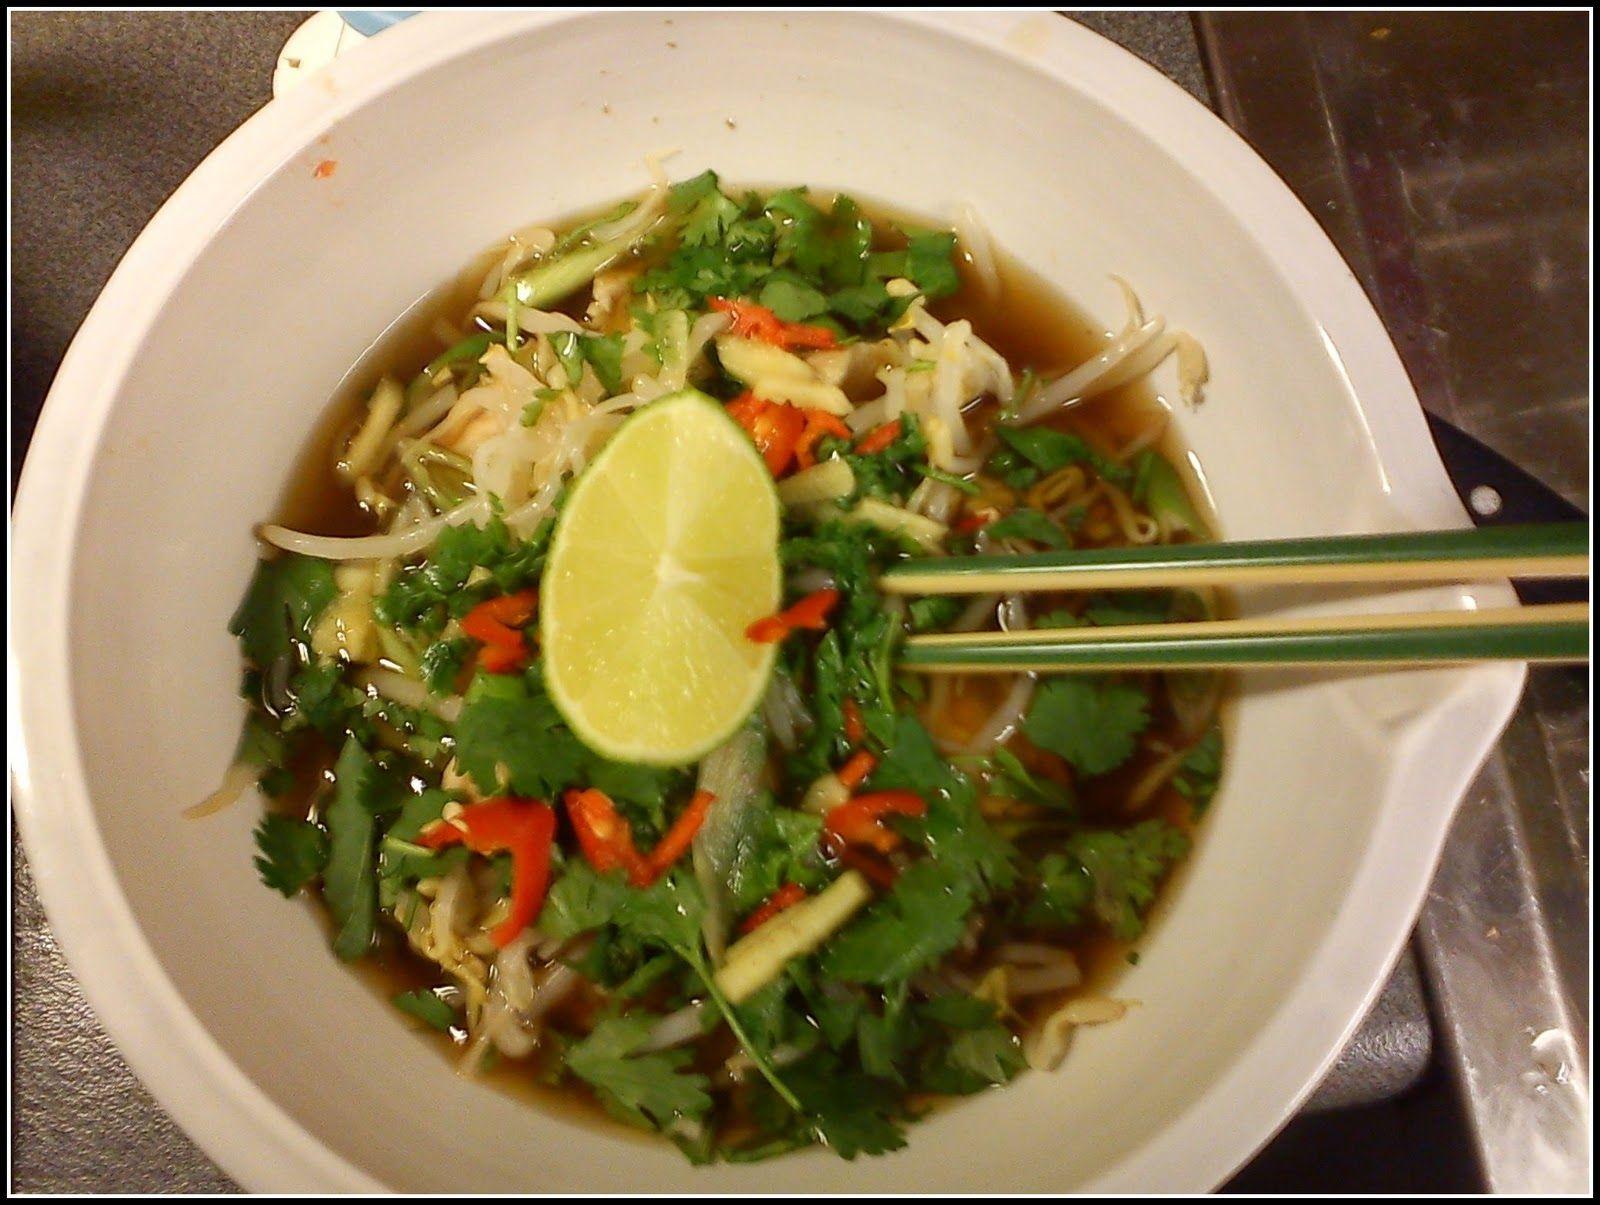 Emma i köket: Pho bo - vietnamesisk soppa